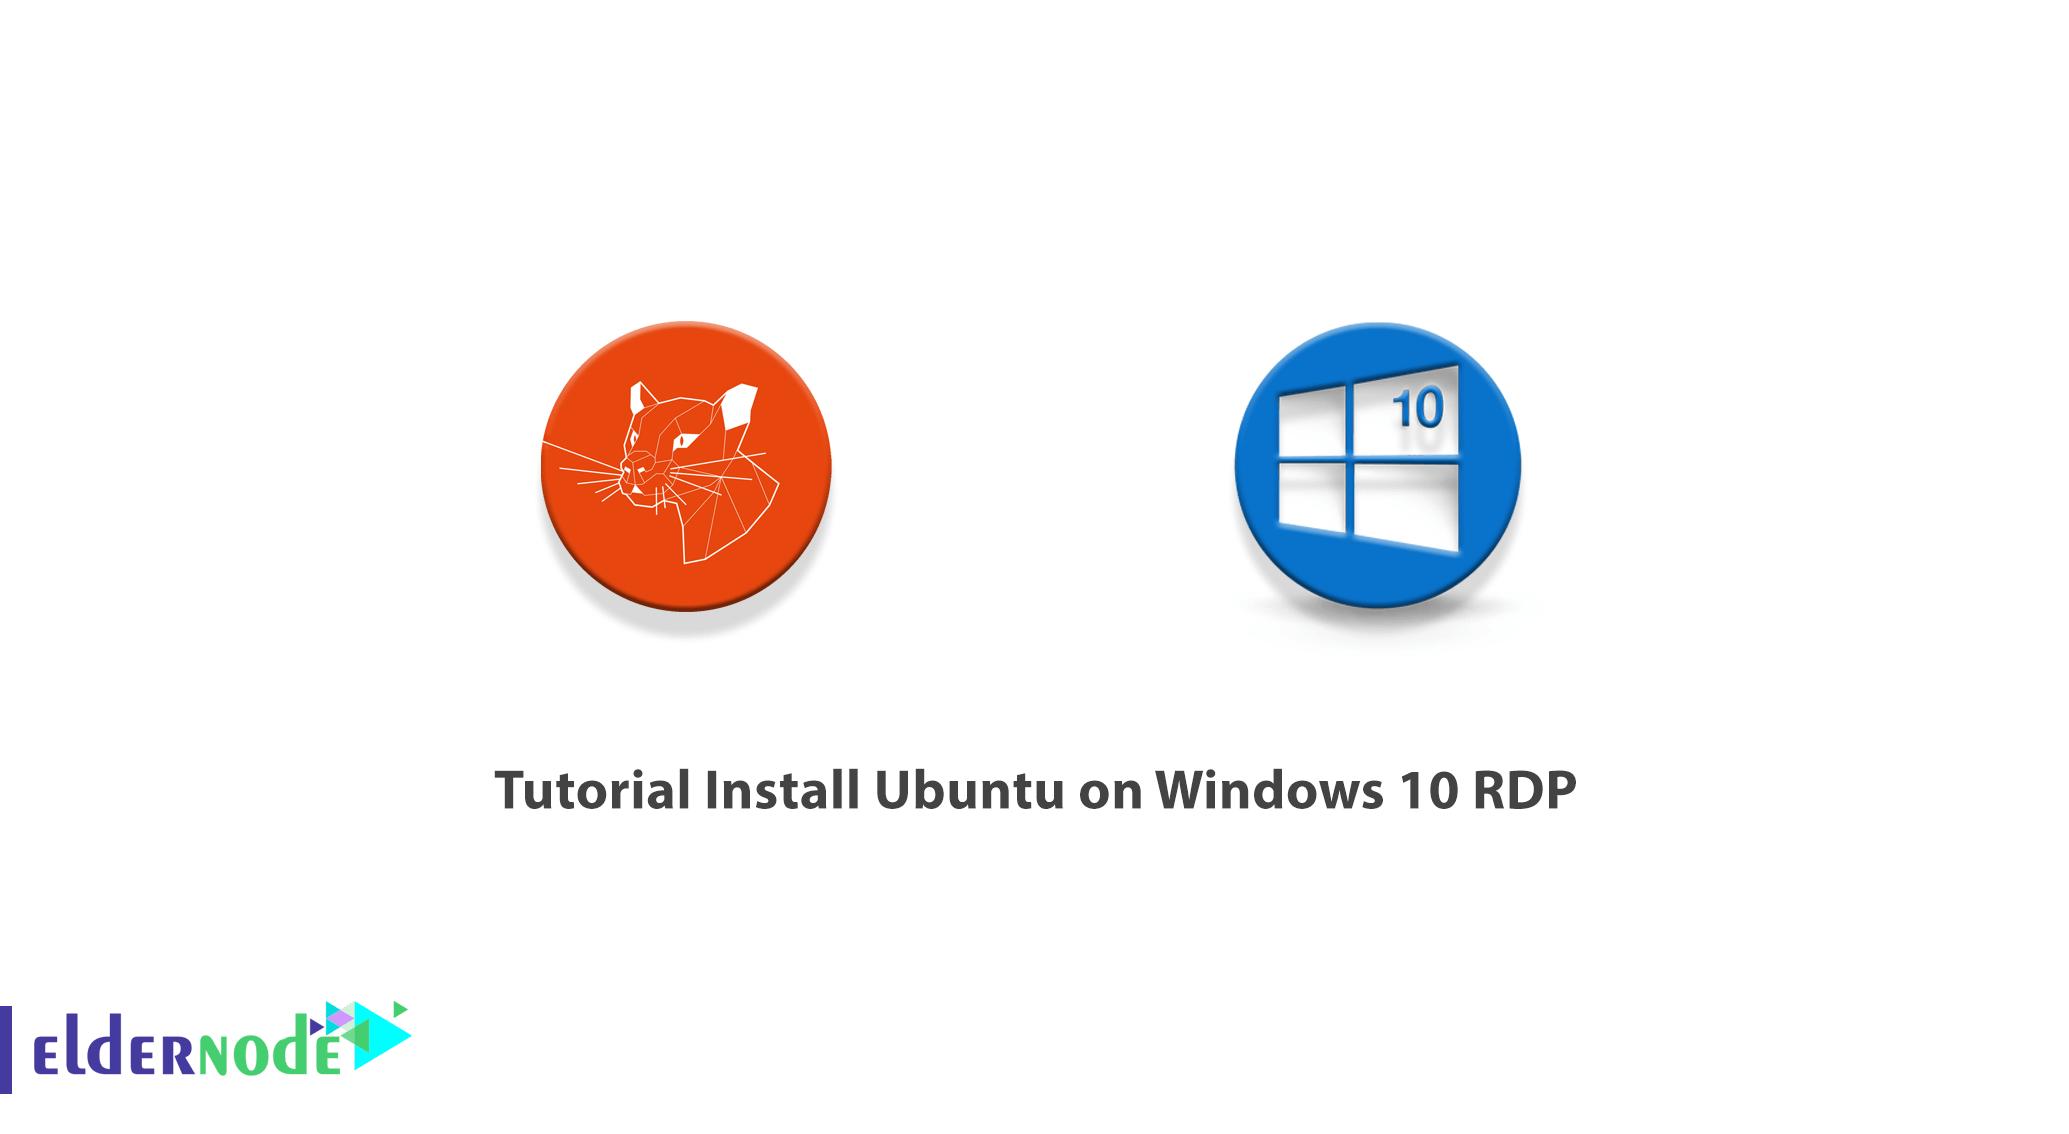 Tutorial Install Ubuntu on Windows 10 RDP